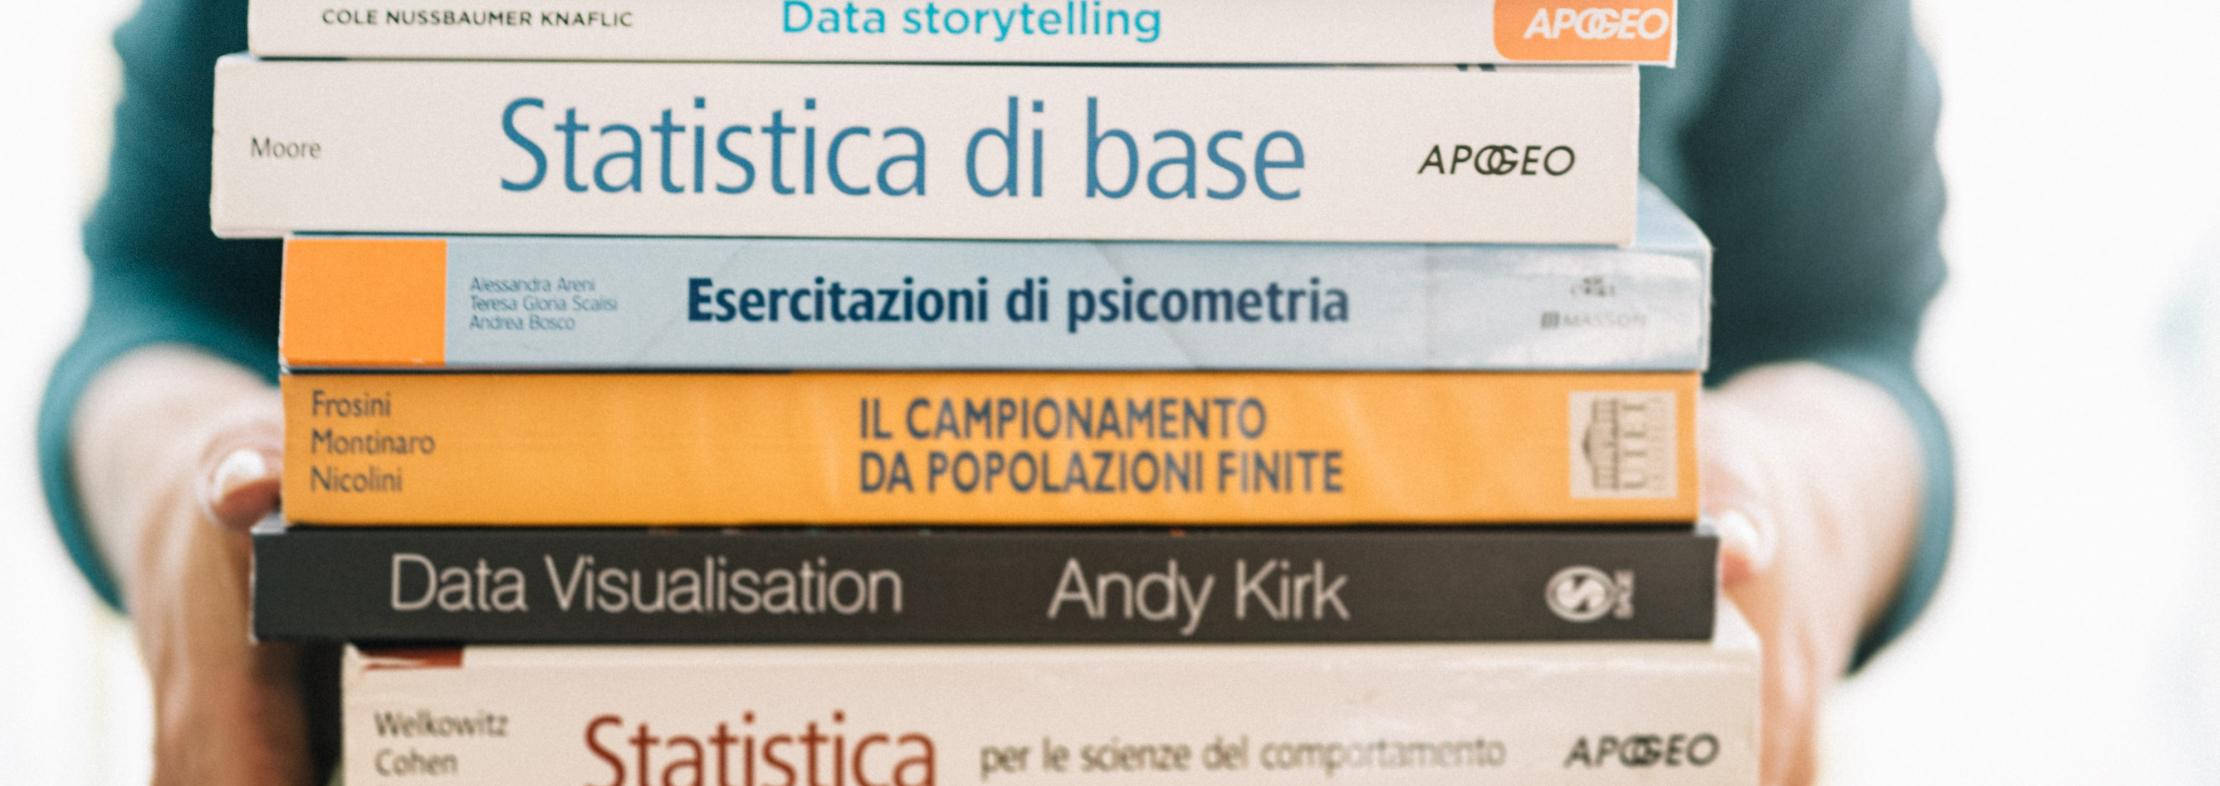 Consulenza statistica gratuita